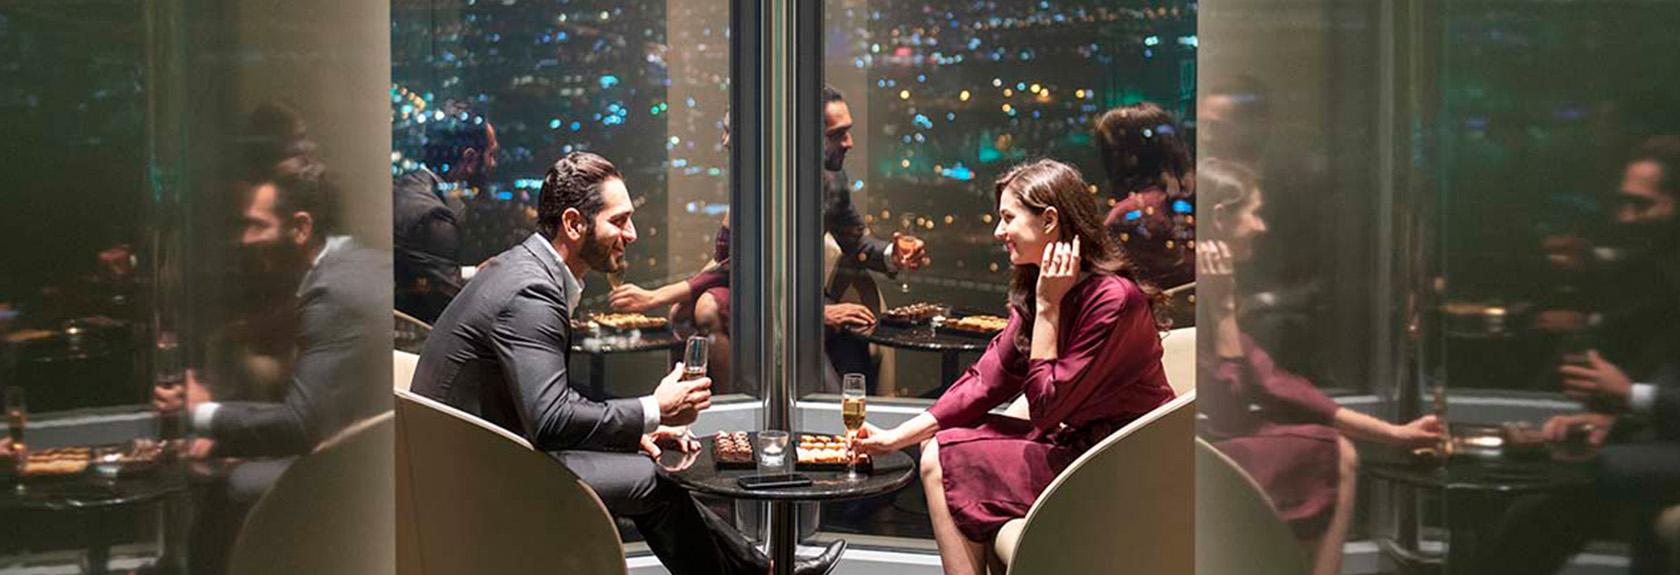 The Lounge Burj Khalifa – the highest lounge in the world